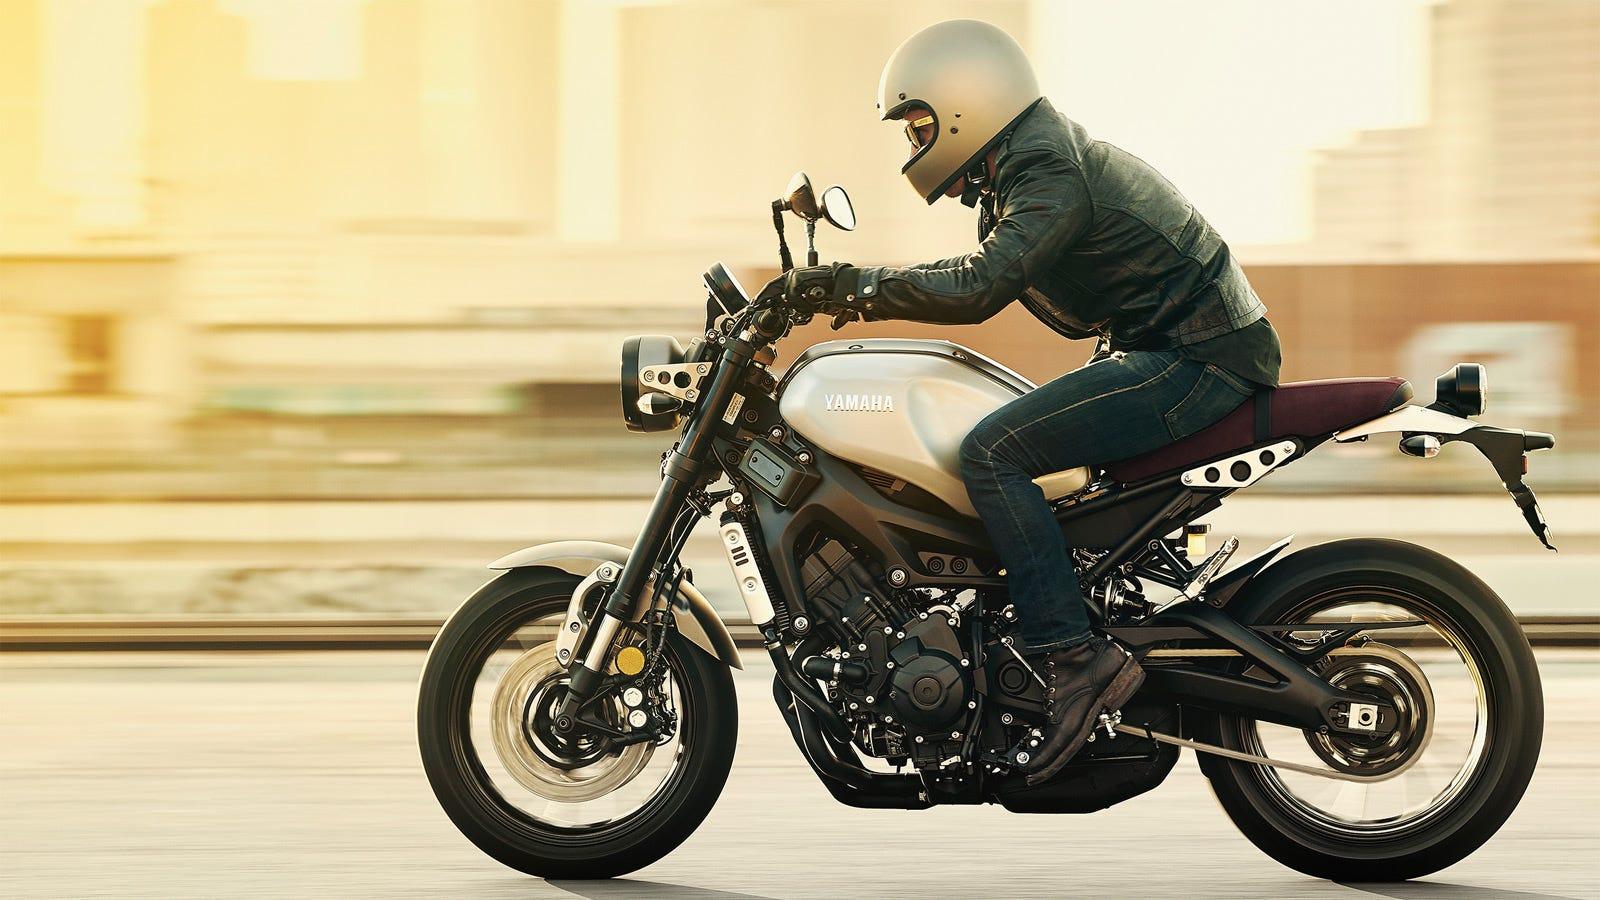 S Yamaha Motorcycles Club